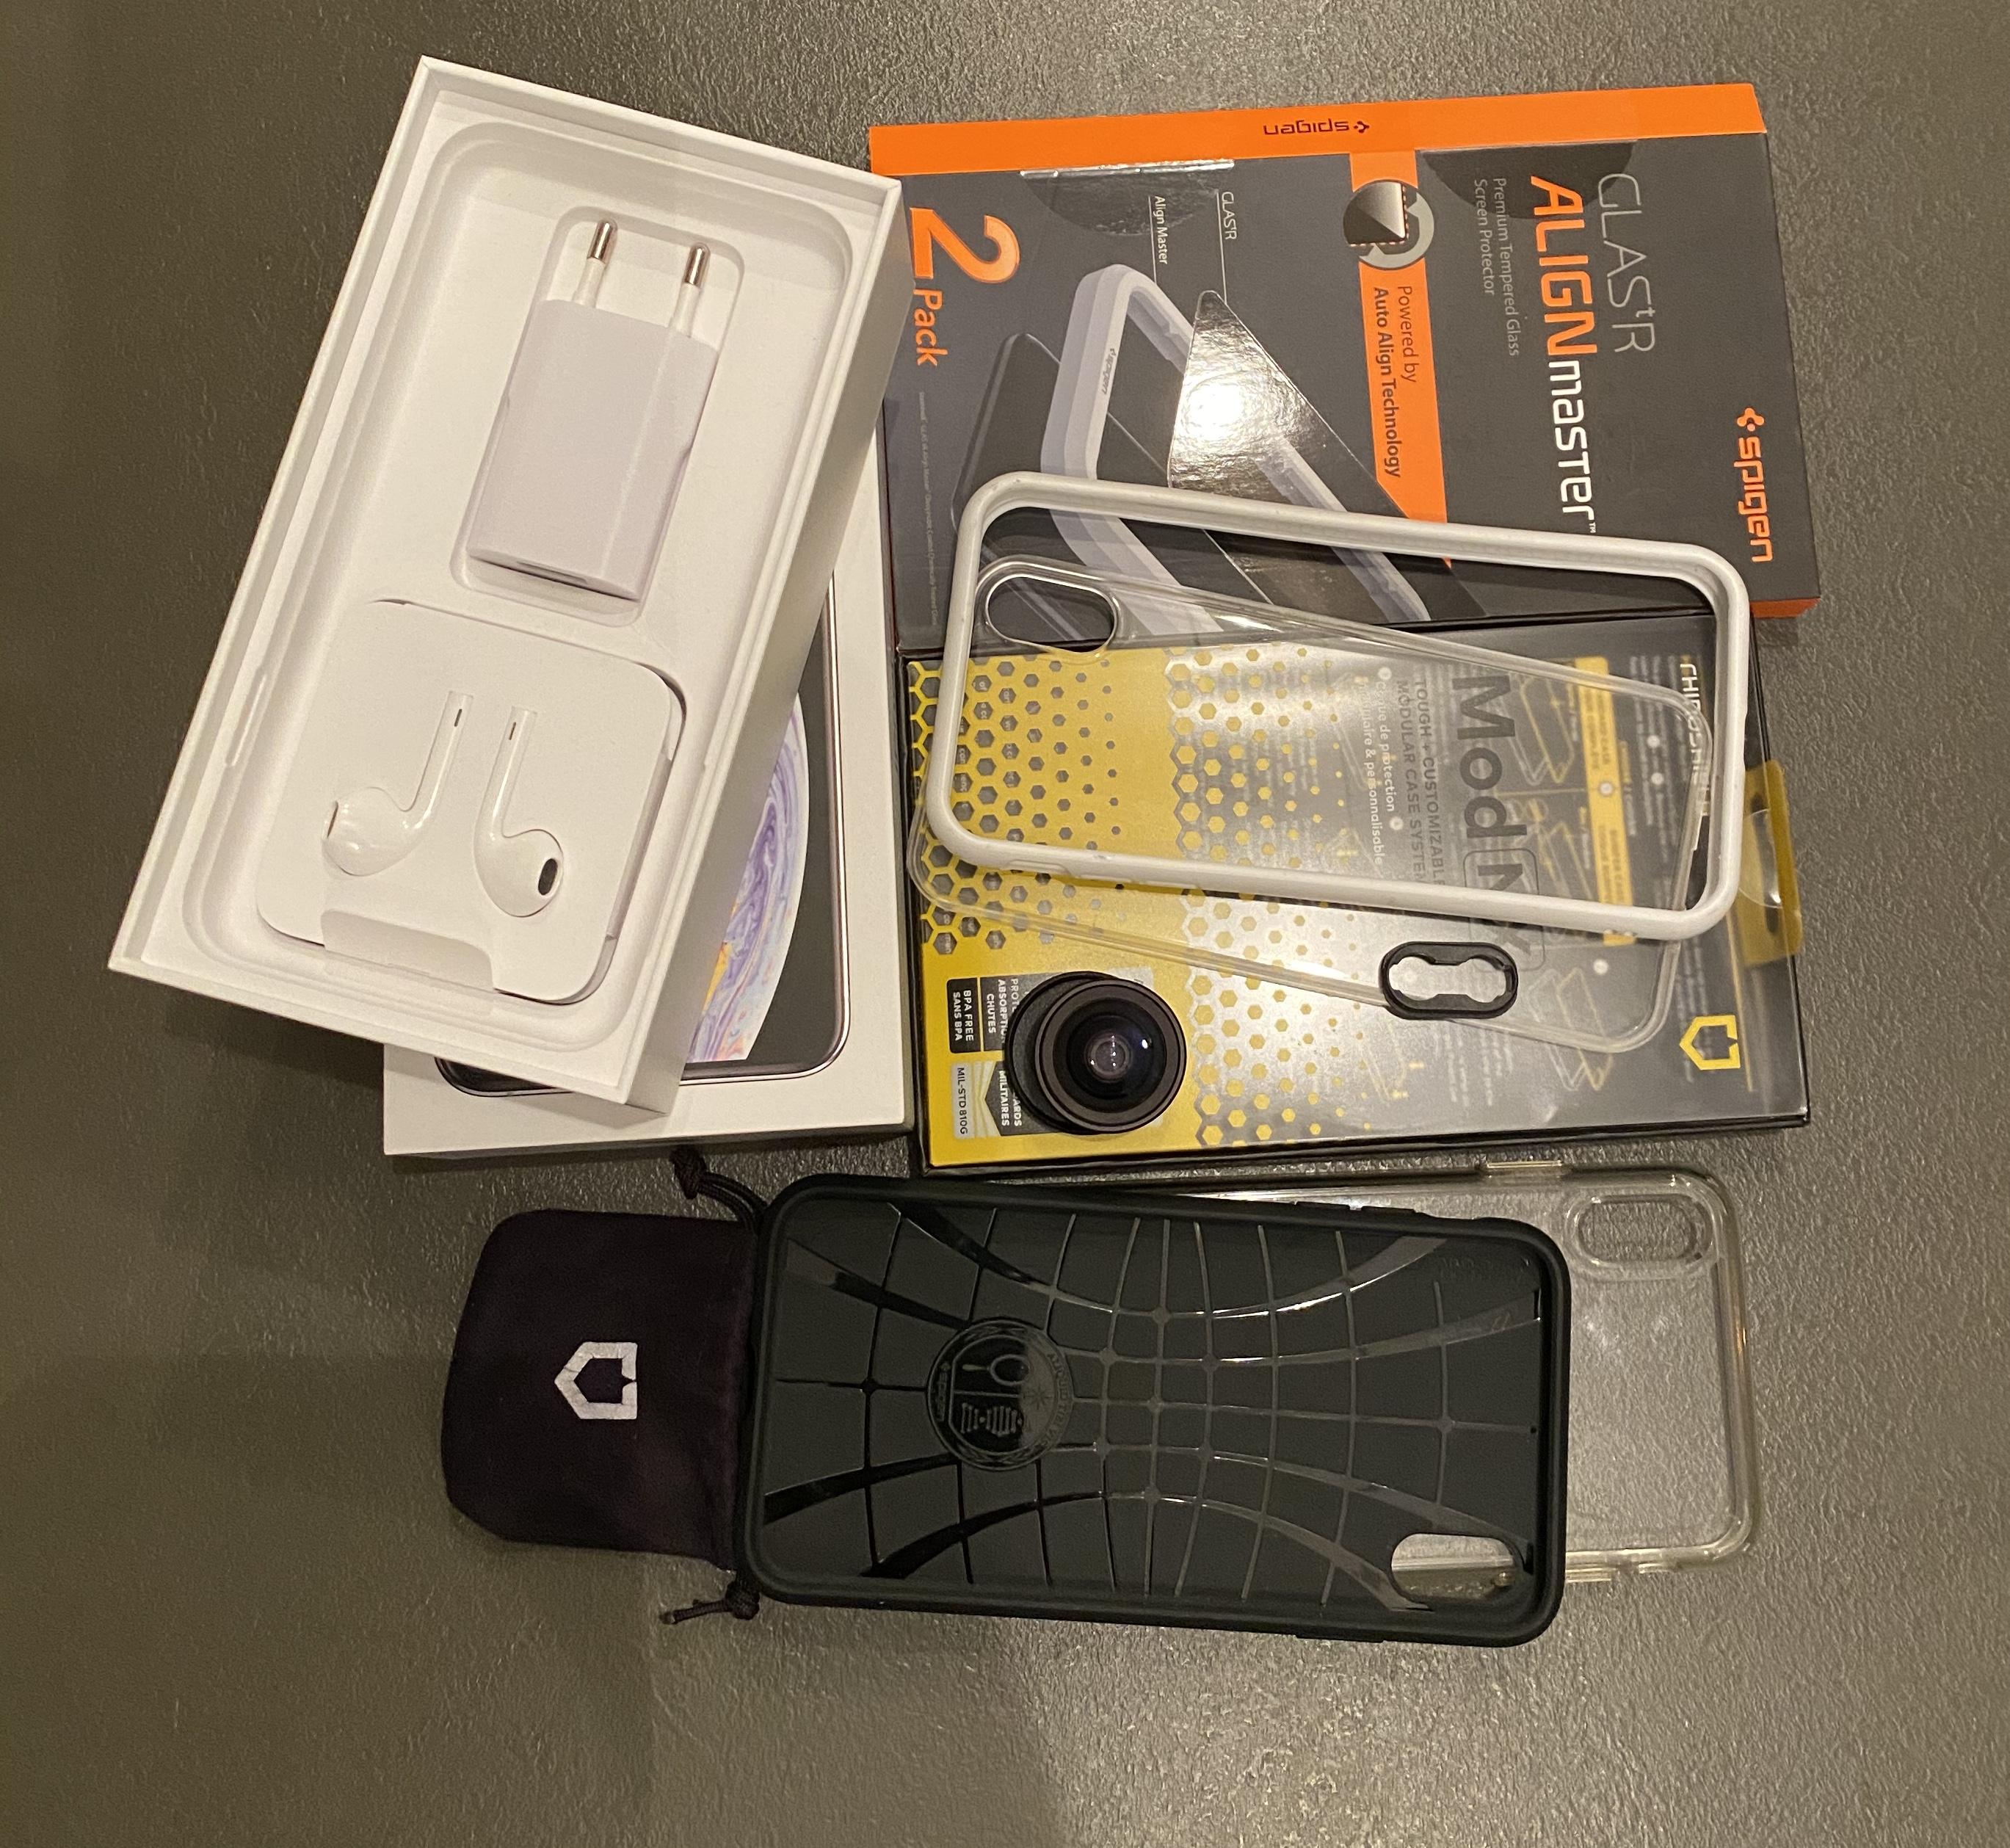 IPhoneXS Max 512Go 15 jours/AppleCare+